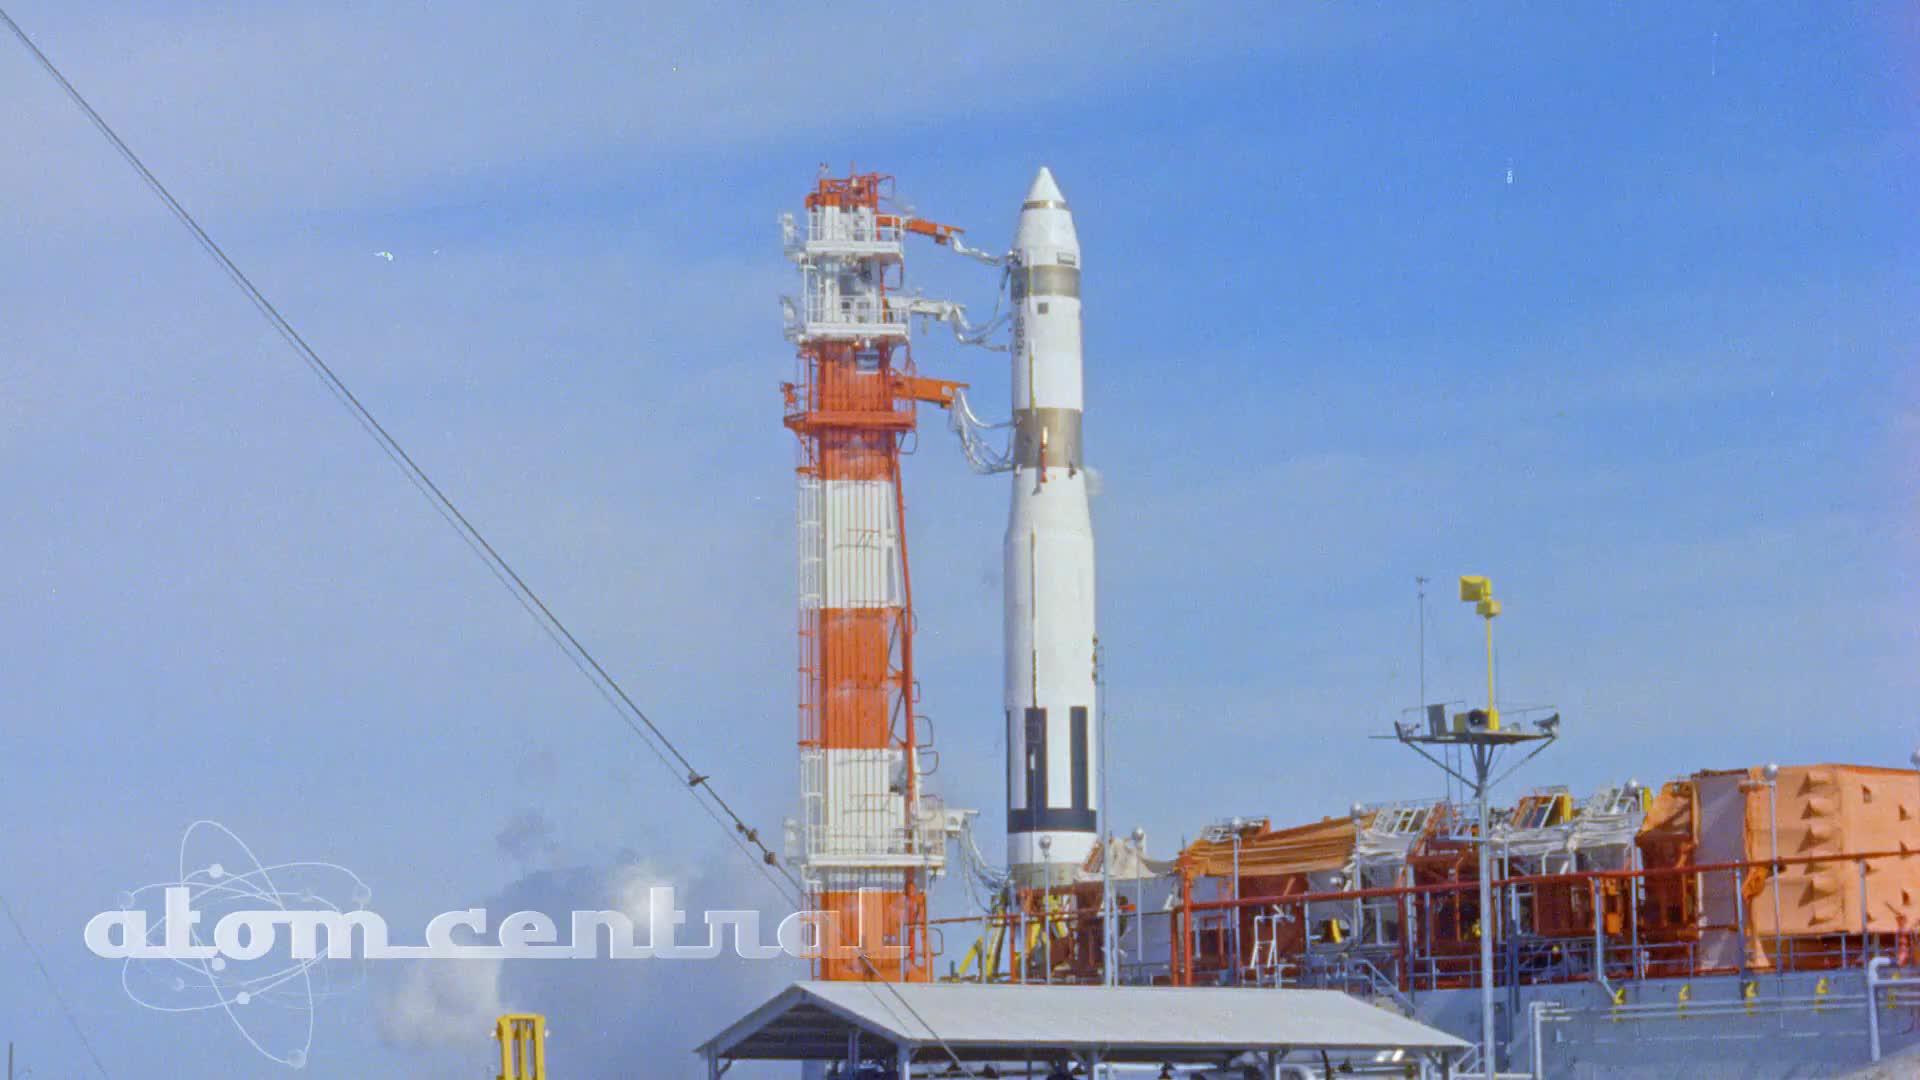 Atlas, amazing, icbm, militarygfys, missile, rocket, spectacular, Titan Missile Explosion HD GIFs